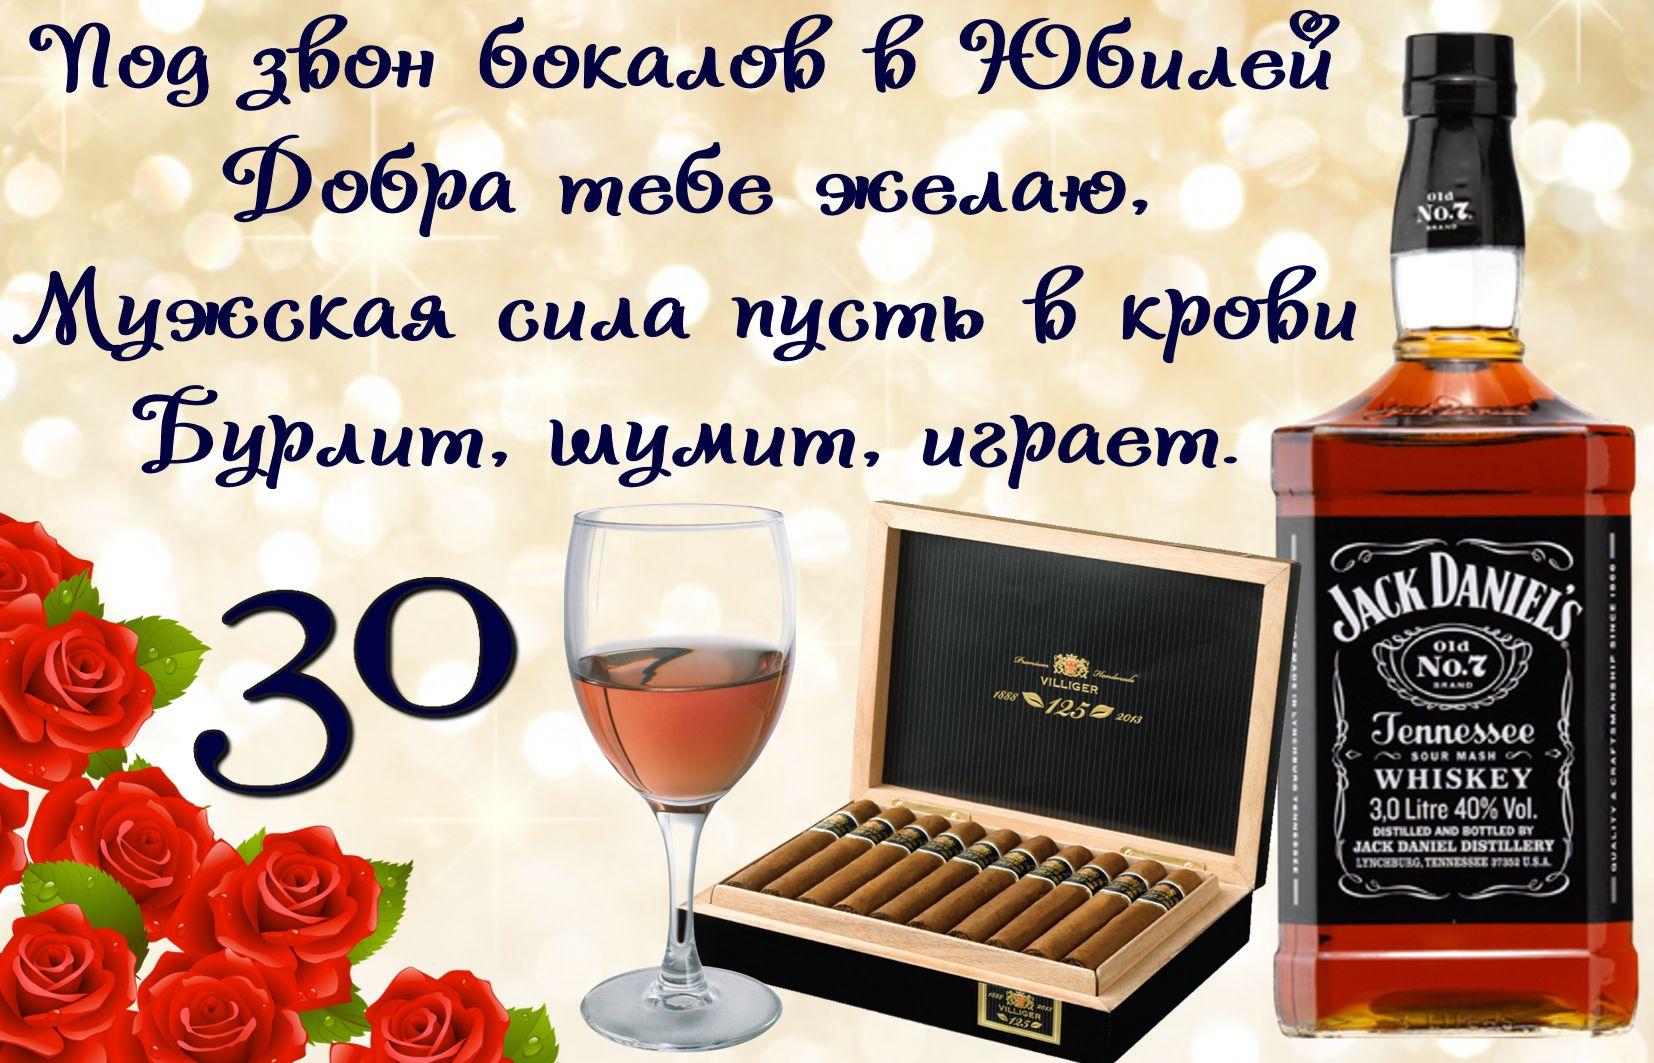 Открытка - сигары и виски на 30 лет мужчине